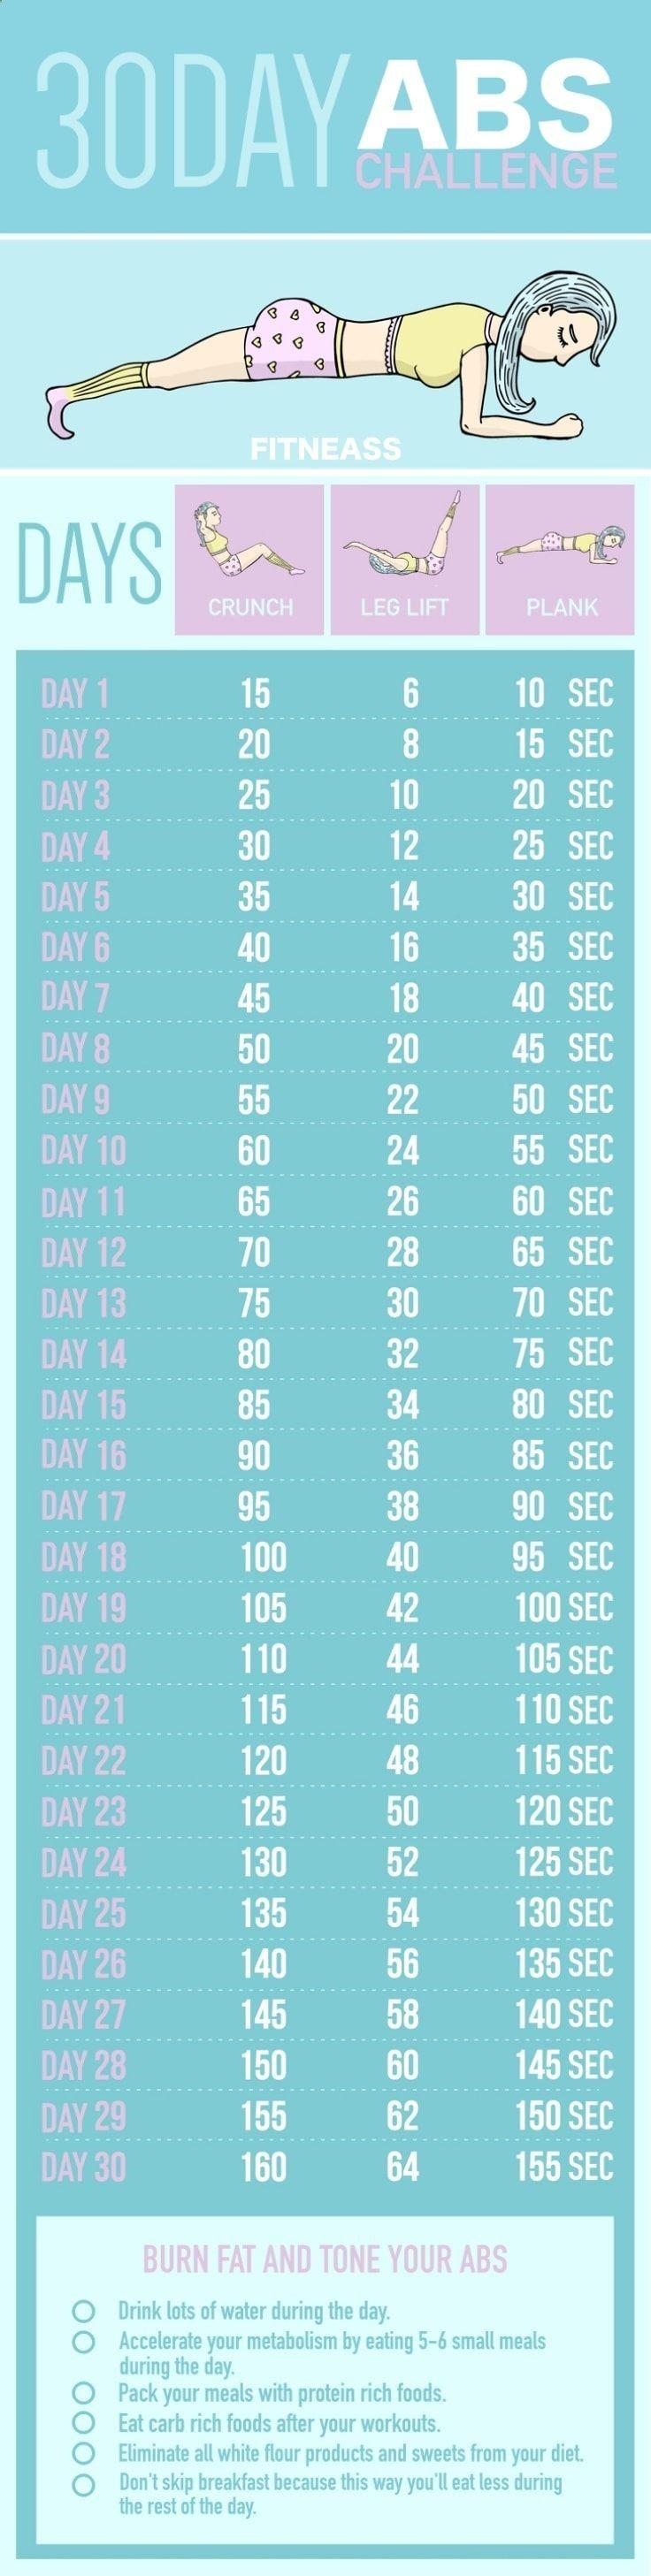 Quick Weight Loss Center 3 Day Diet